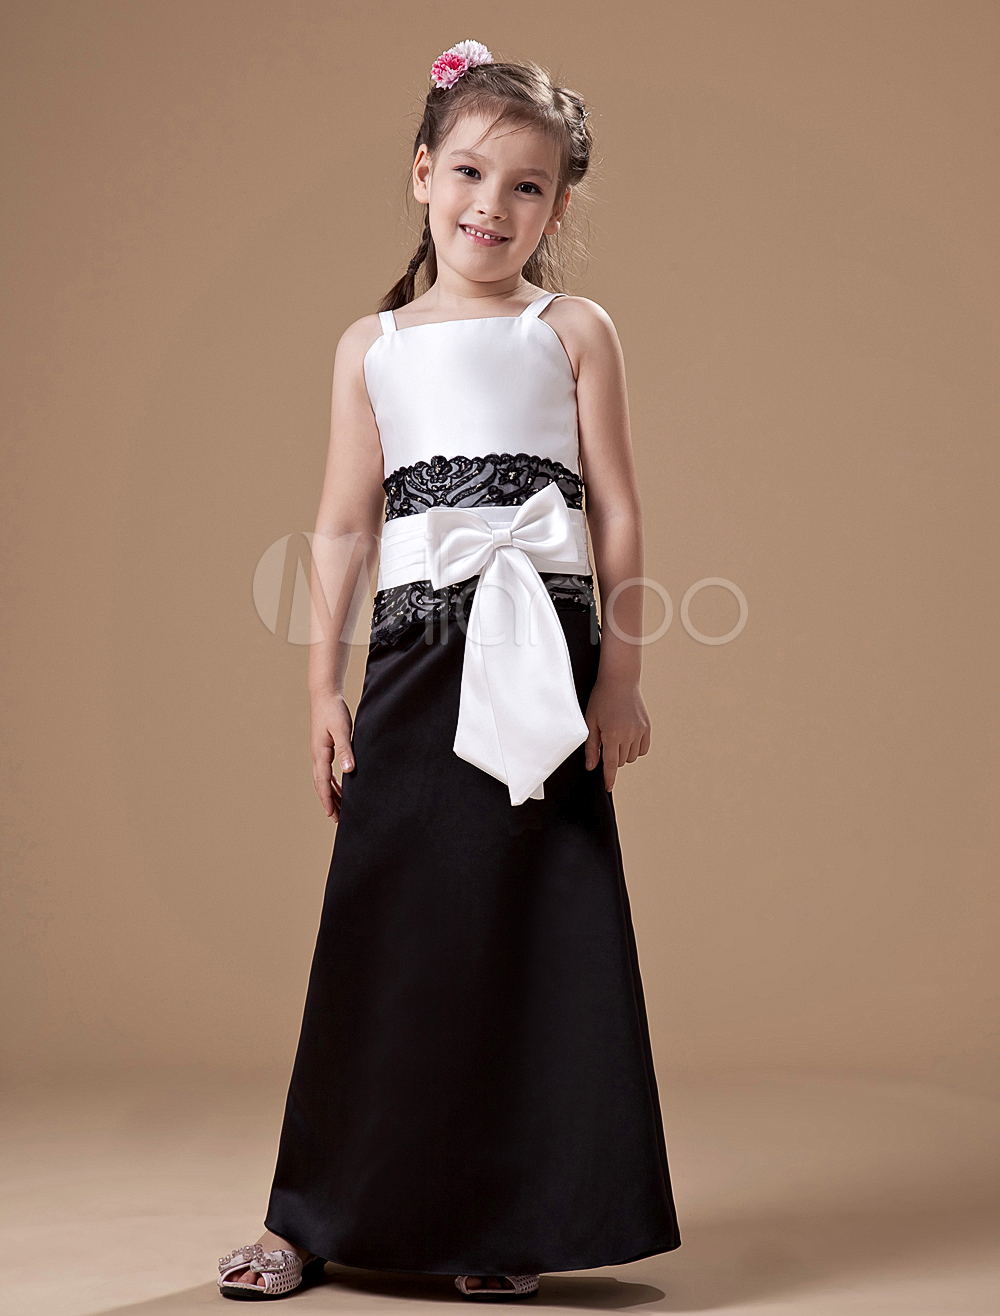 Mermaid satin junior bridesmaid dress with sash spaghetti straps 30off ombrellifo Images